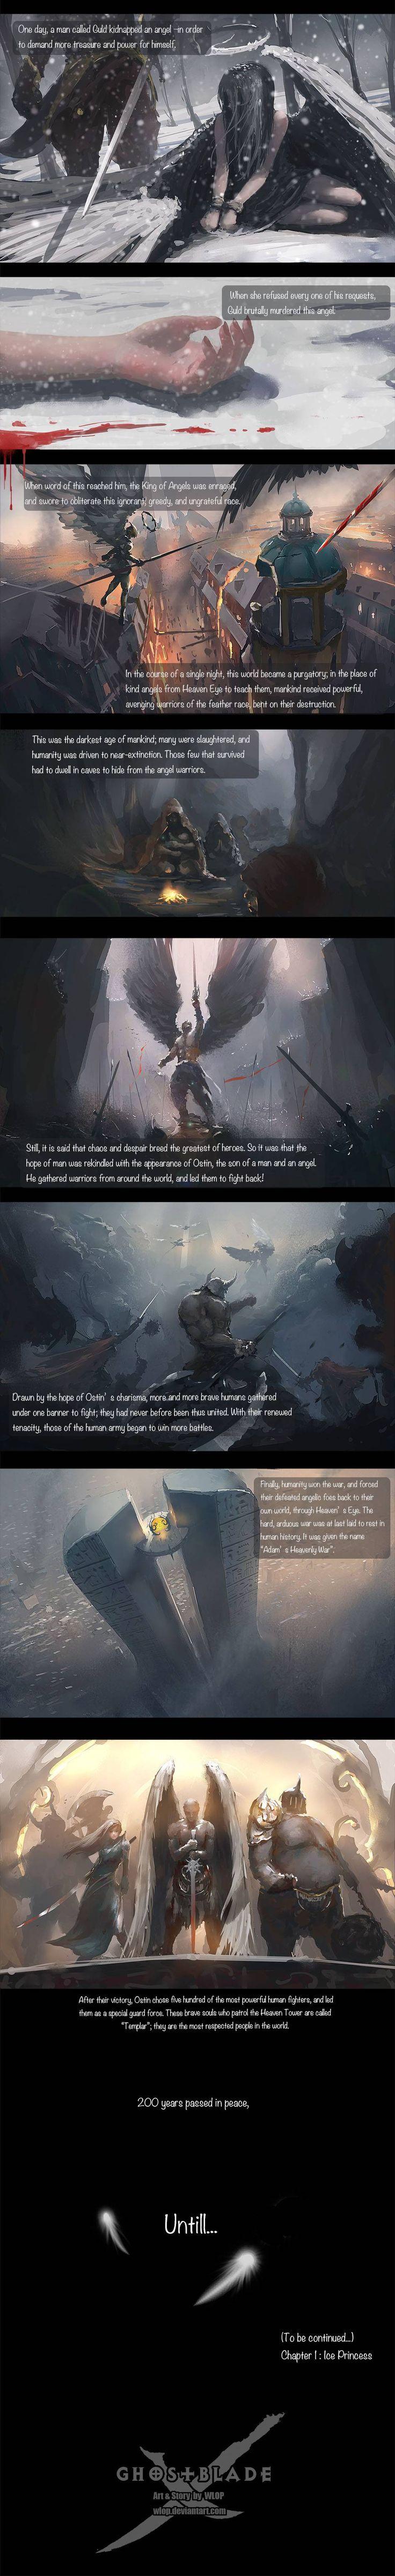 GhostBlade :: Chapter 0 (Intro): Heaven Eye | Tapastic Comics - image 2